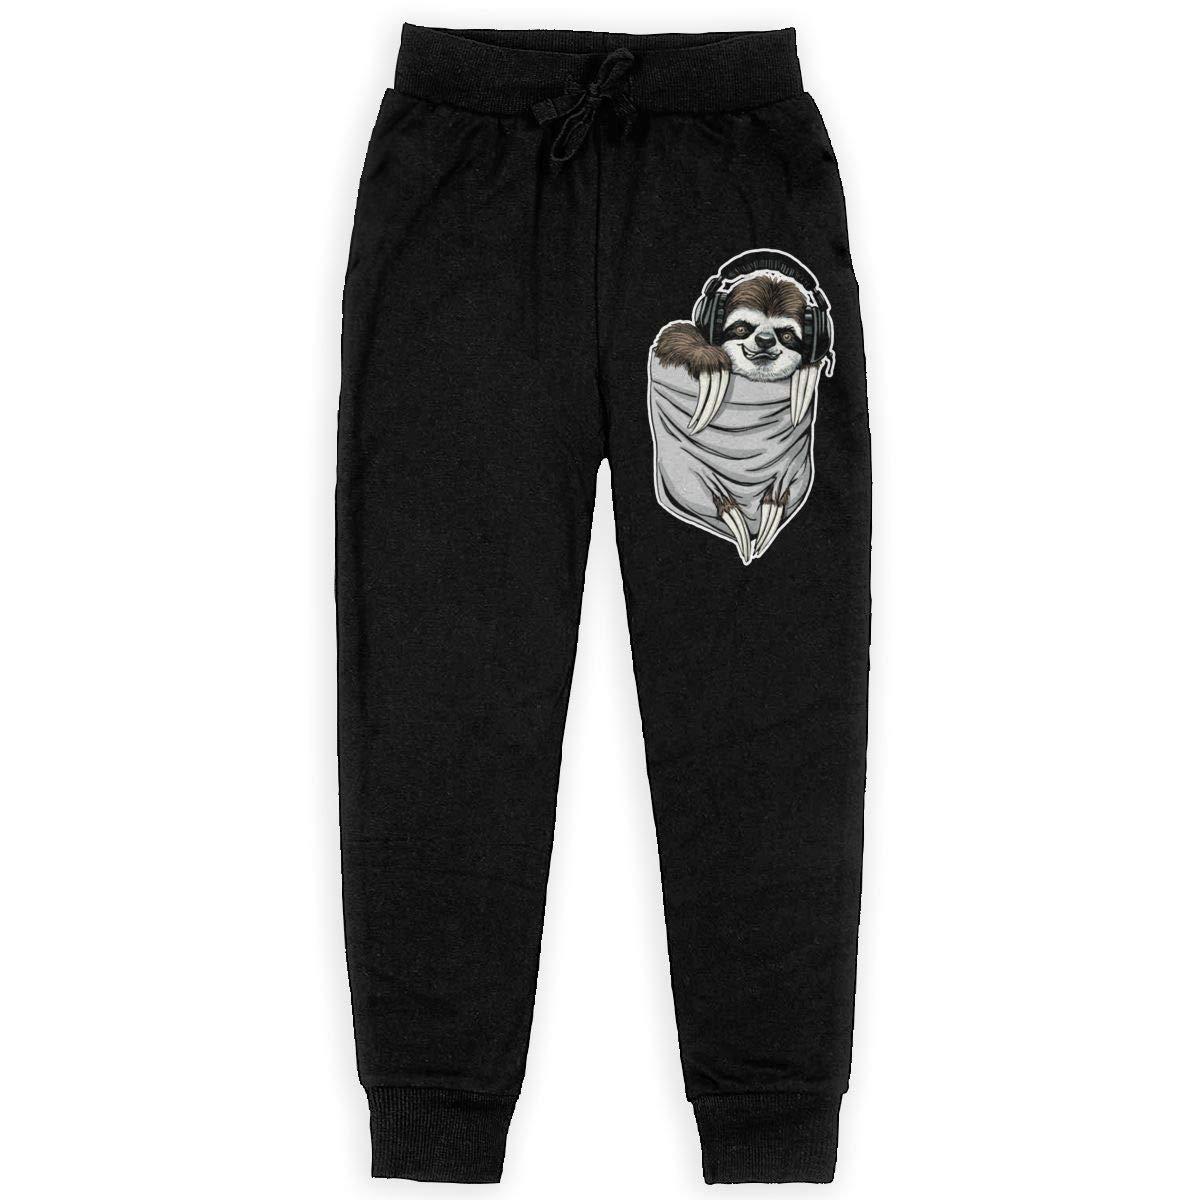 Bing4Bing Pocket Sloth with Music Headphones Boys Cotton Sweatpants Comfortable Joggers Pants Active Pants